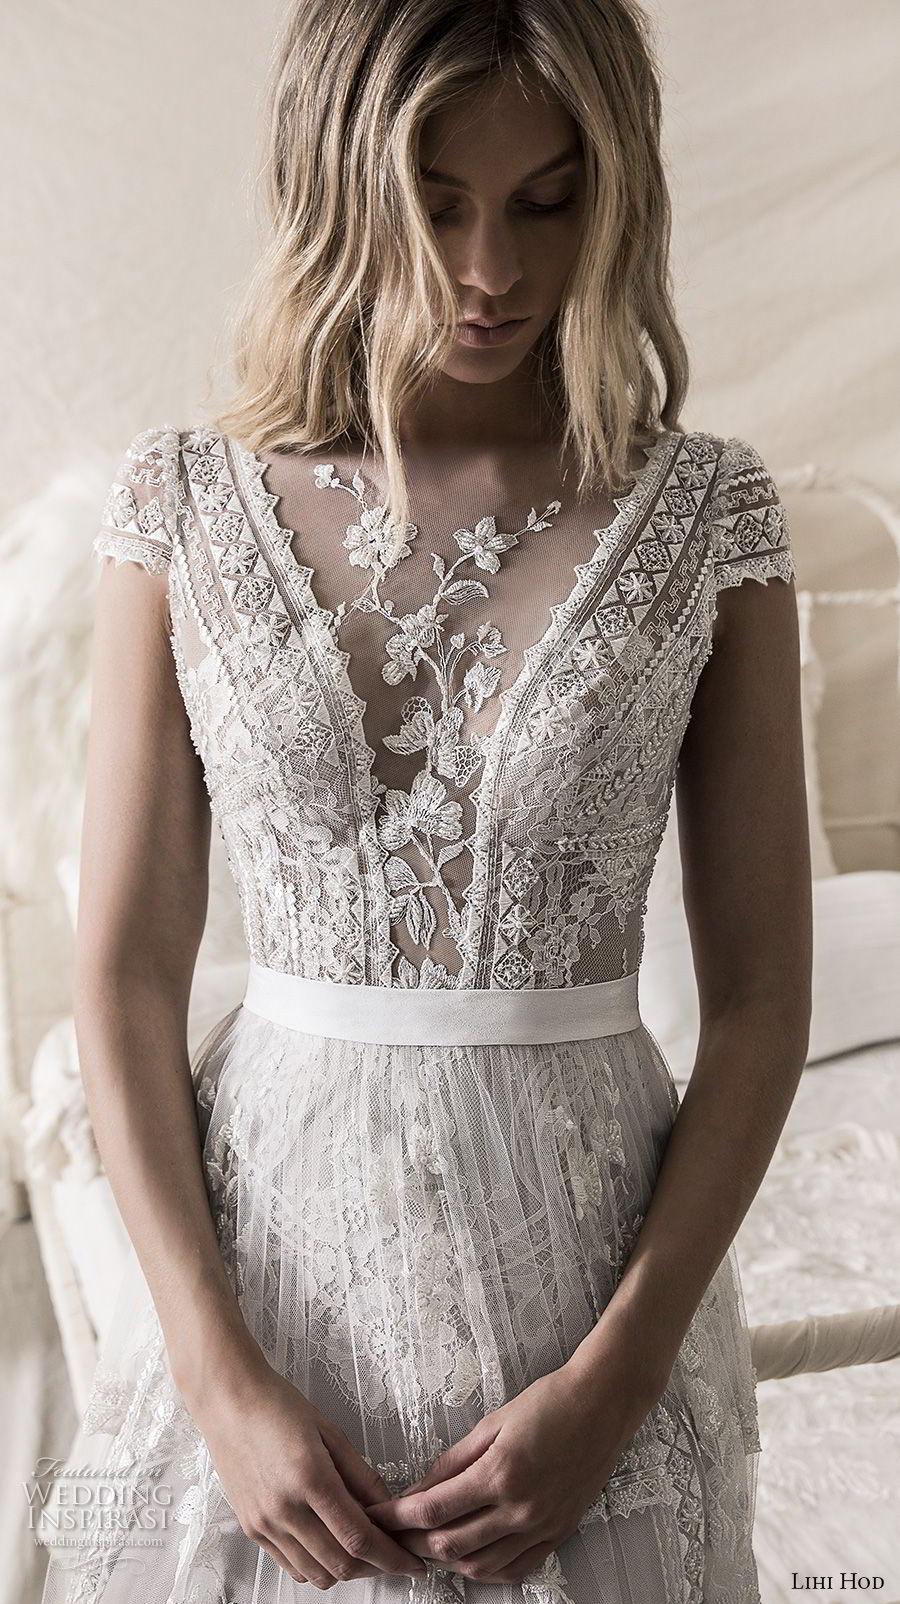 lihi hod 2018 bridal cap sleeves illusion jewel deep v neck heavily embellised bodice romantic bohemian soft a  line wedding dress open strap back sweep train (5) zv